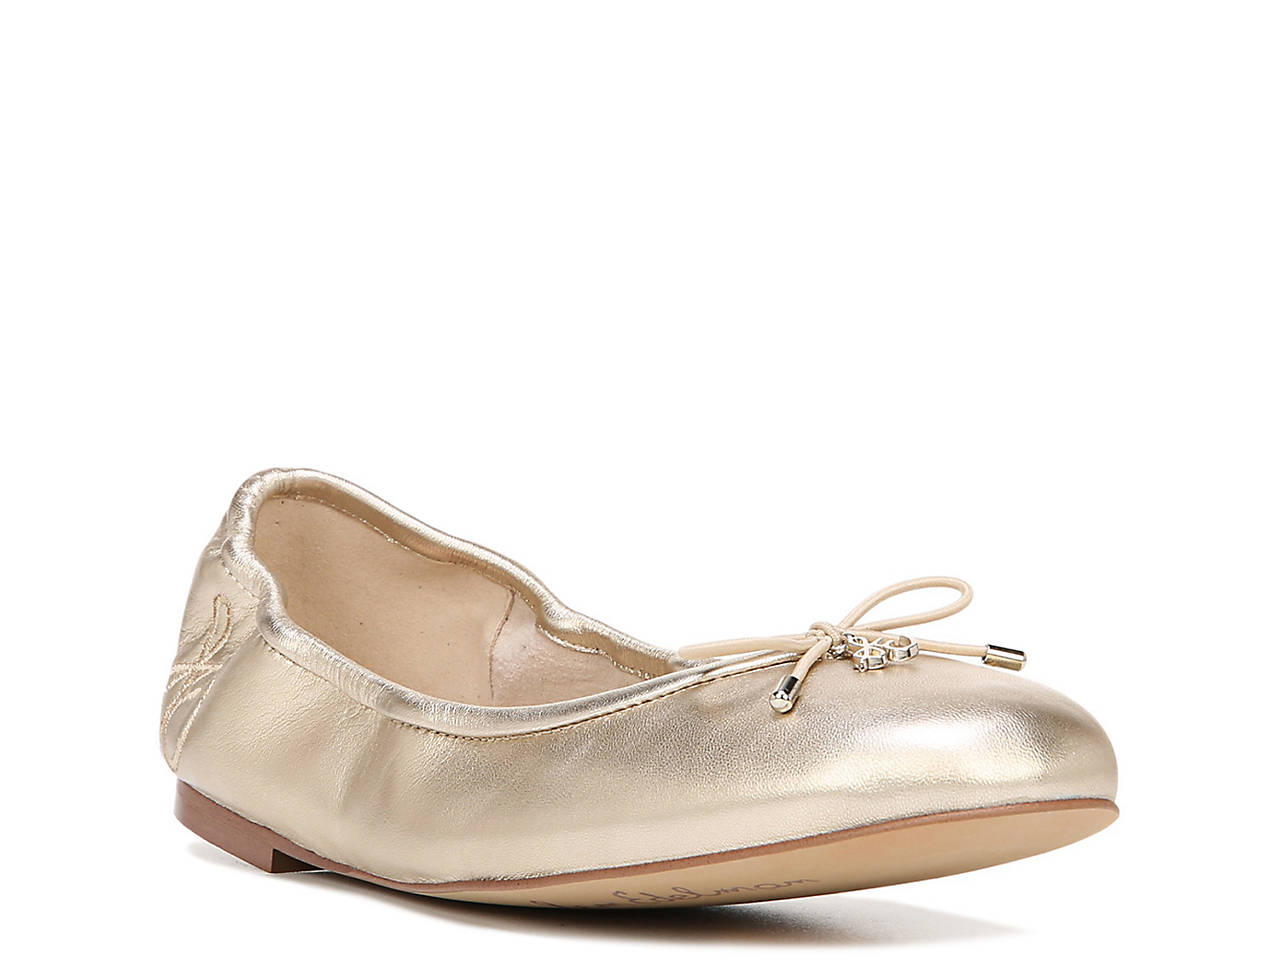 5d64a2c41 Sam Edelman Felicia Ballet Flat Women's Shoes | DSW